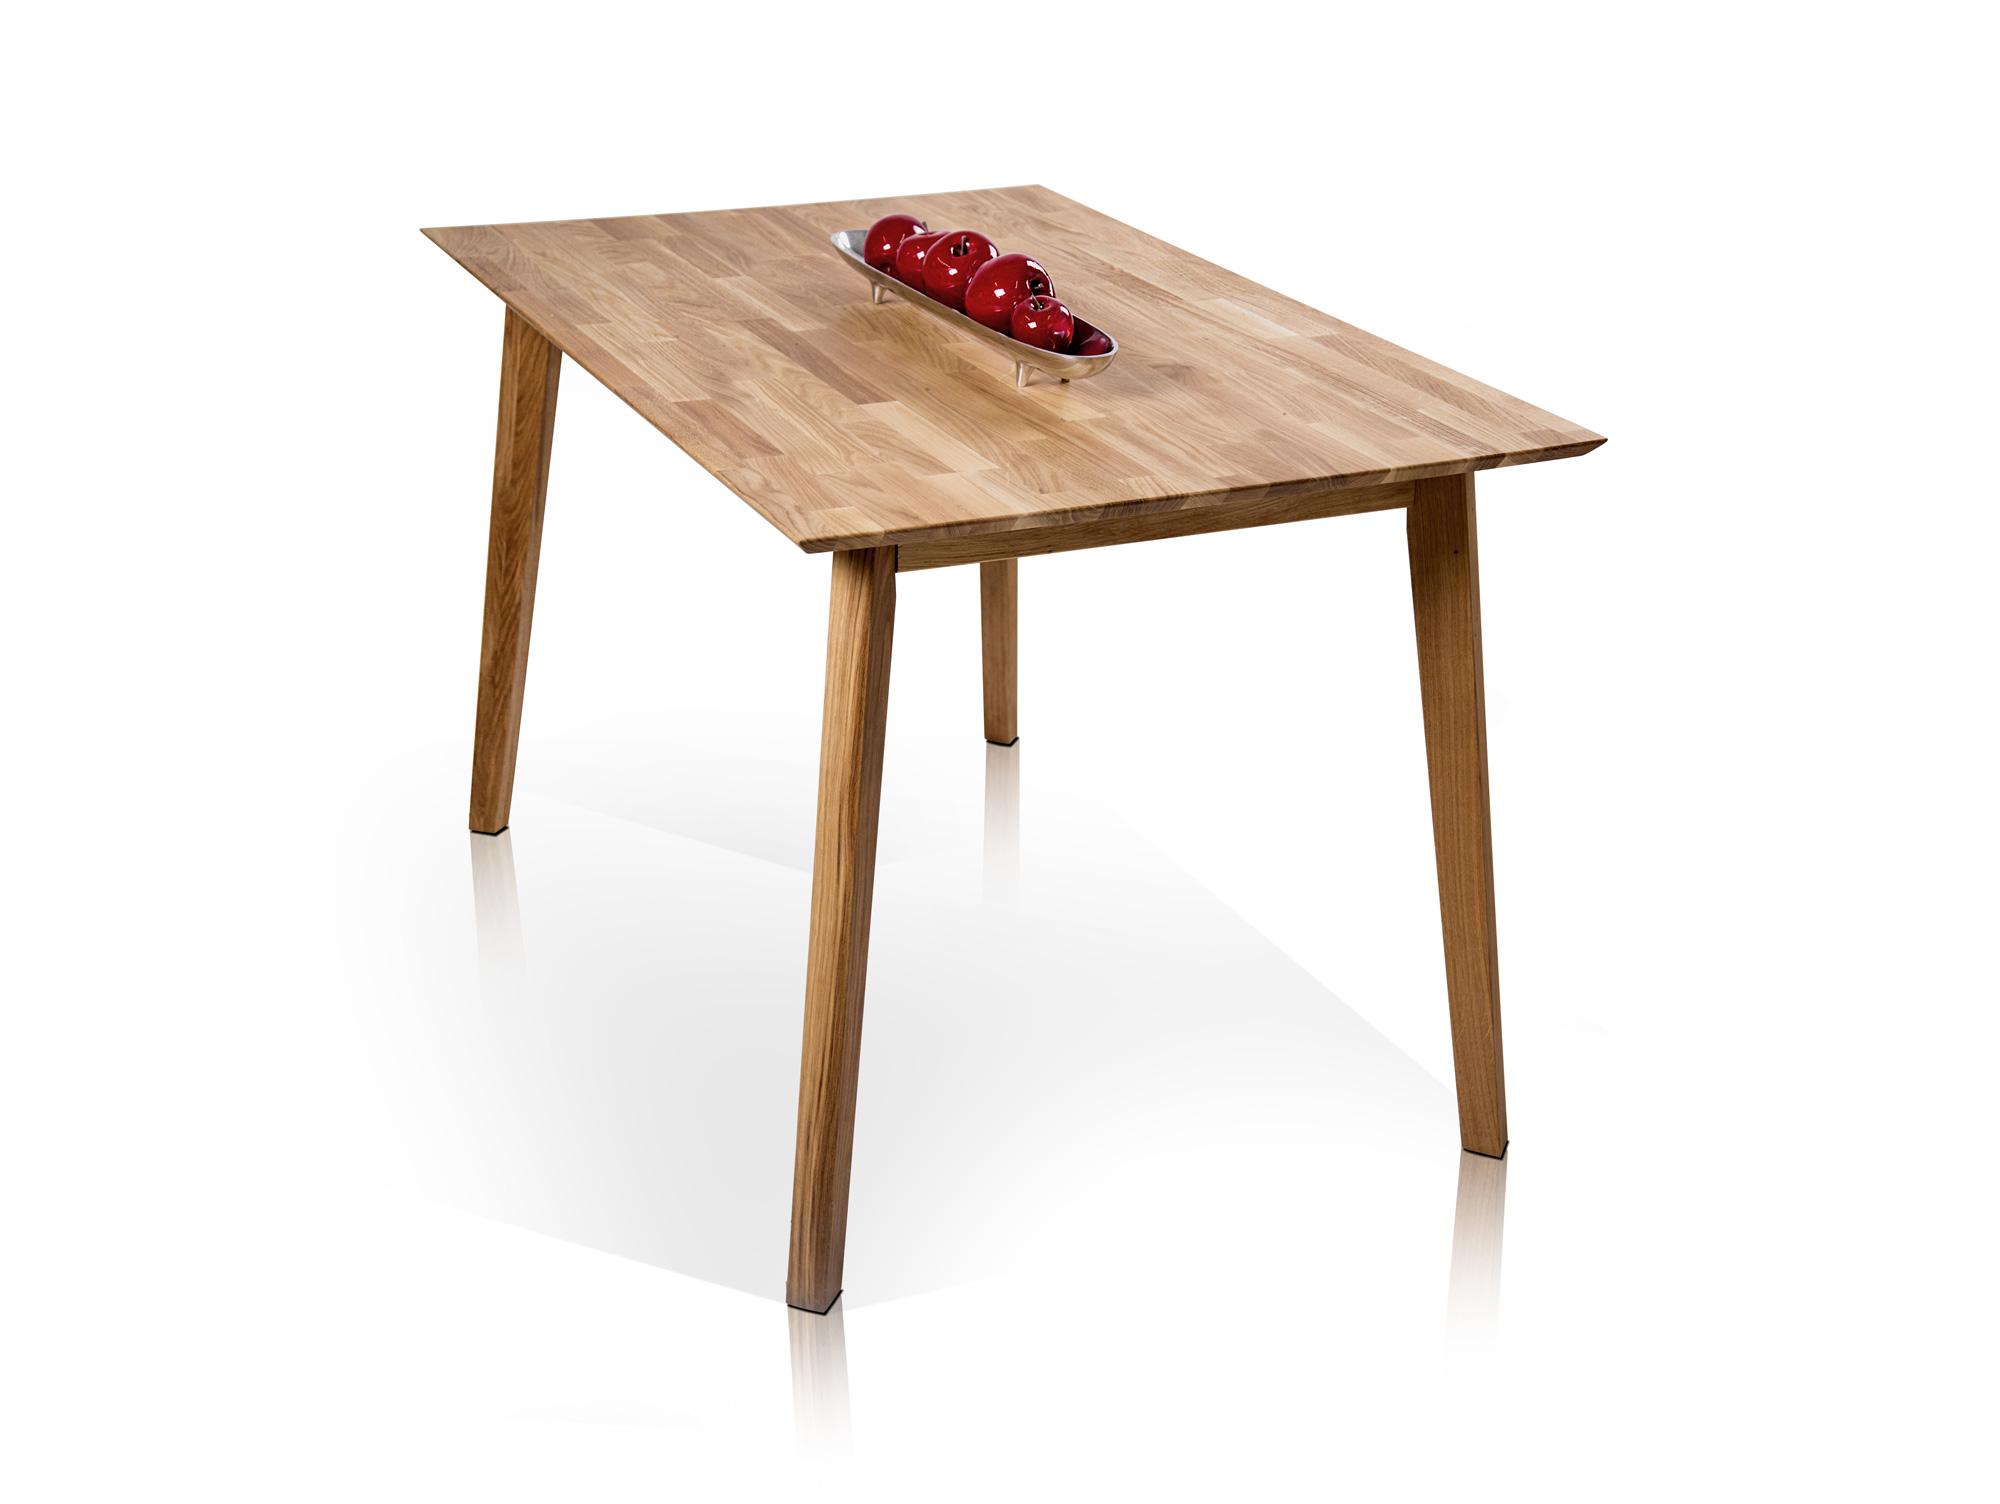 vincent esstisch 120 x 80 cm eiche. Black Bedroom Furniture Sets. Home Design Ideas